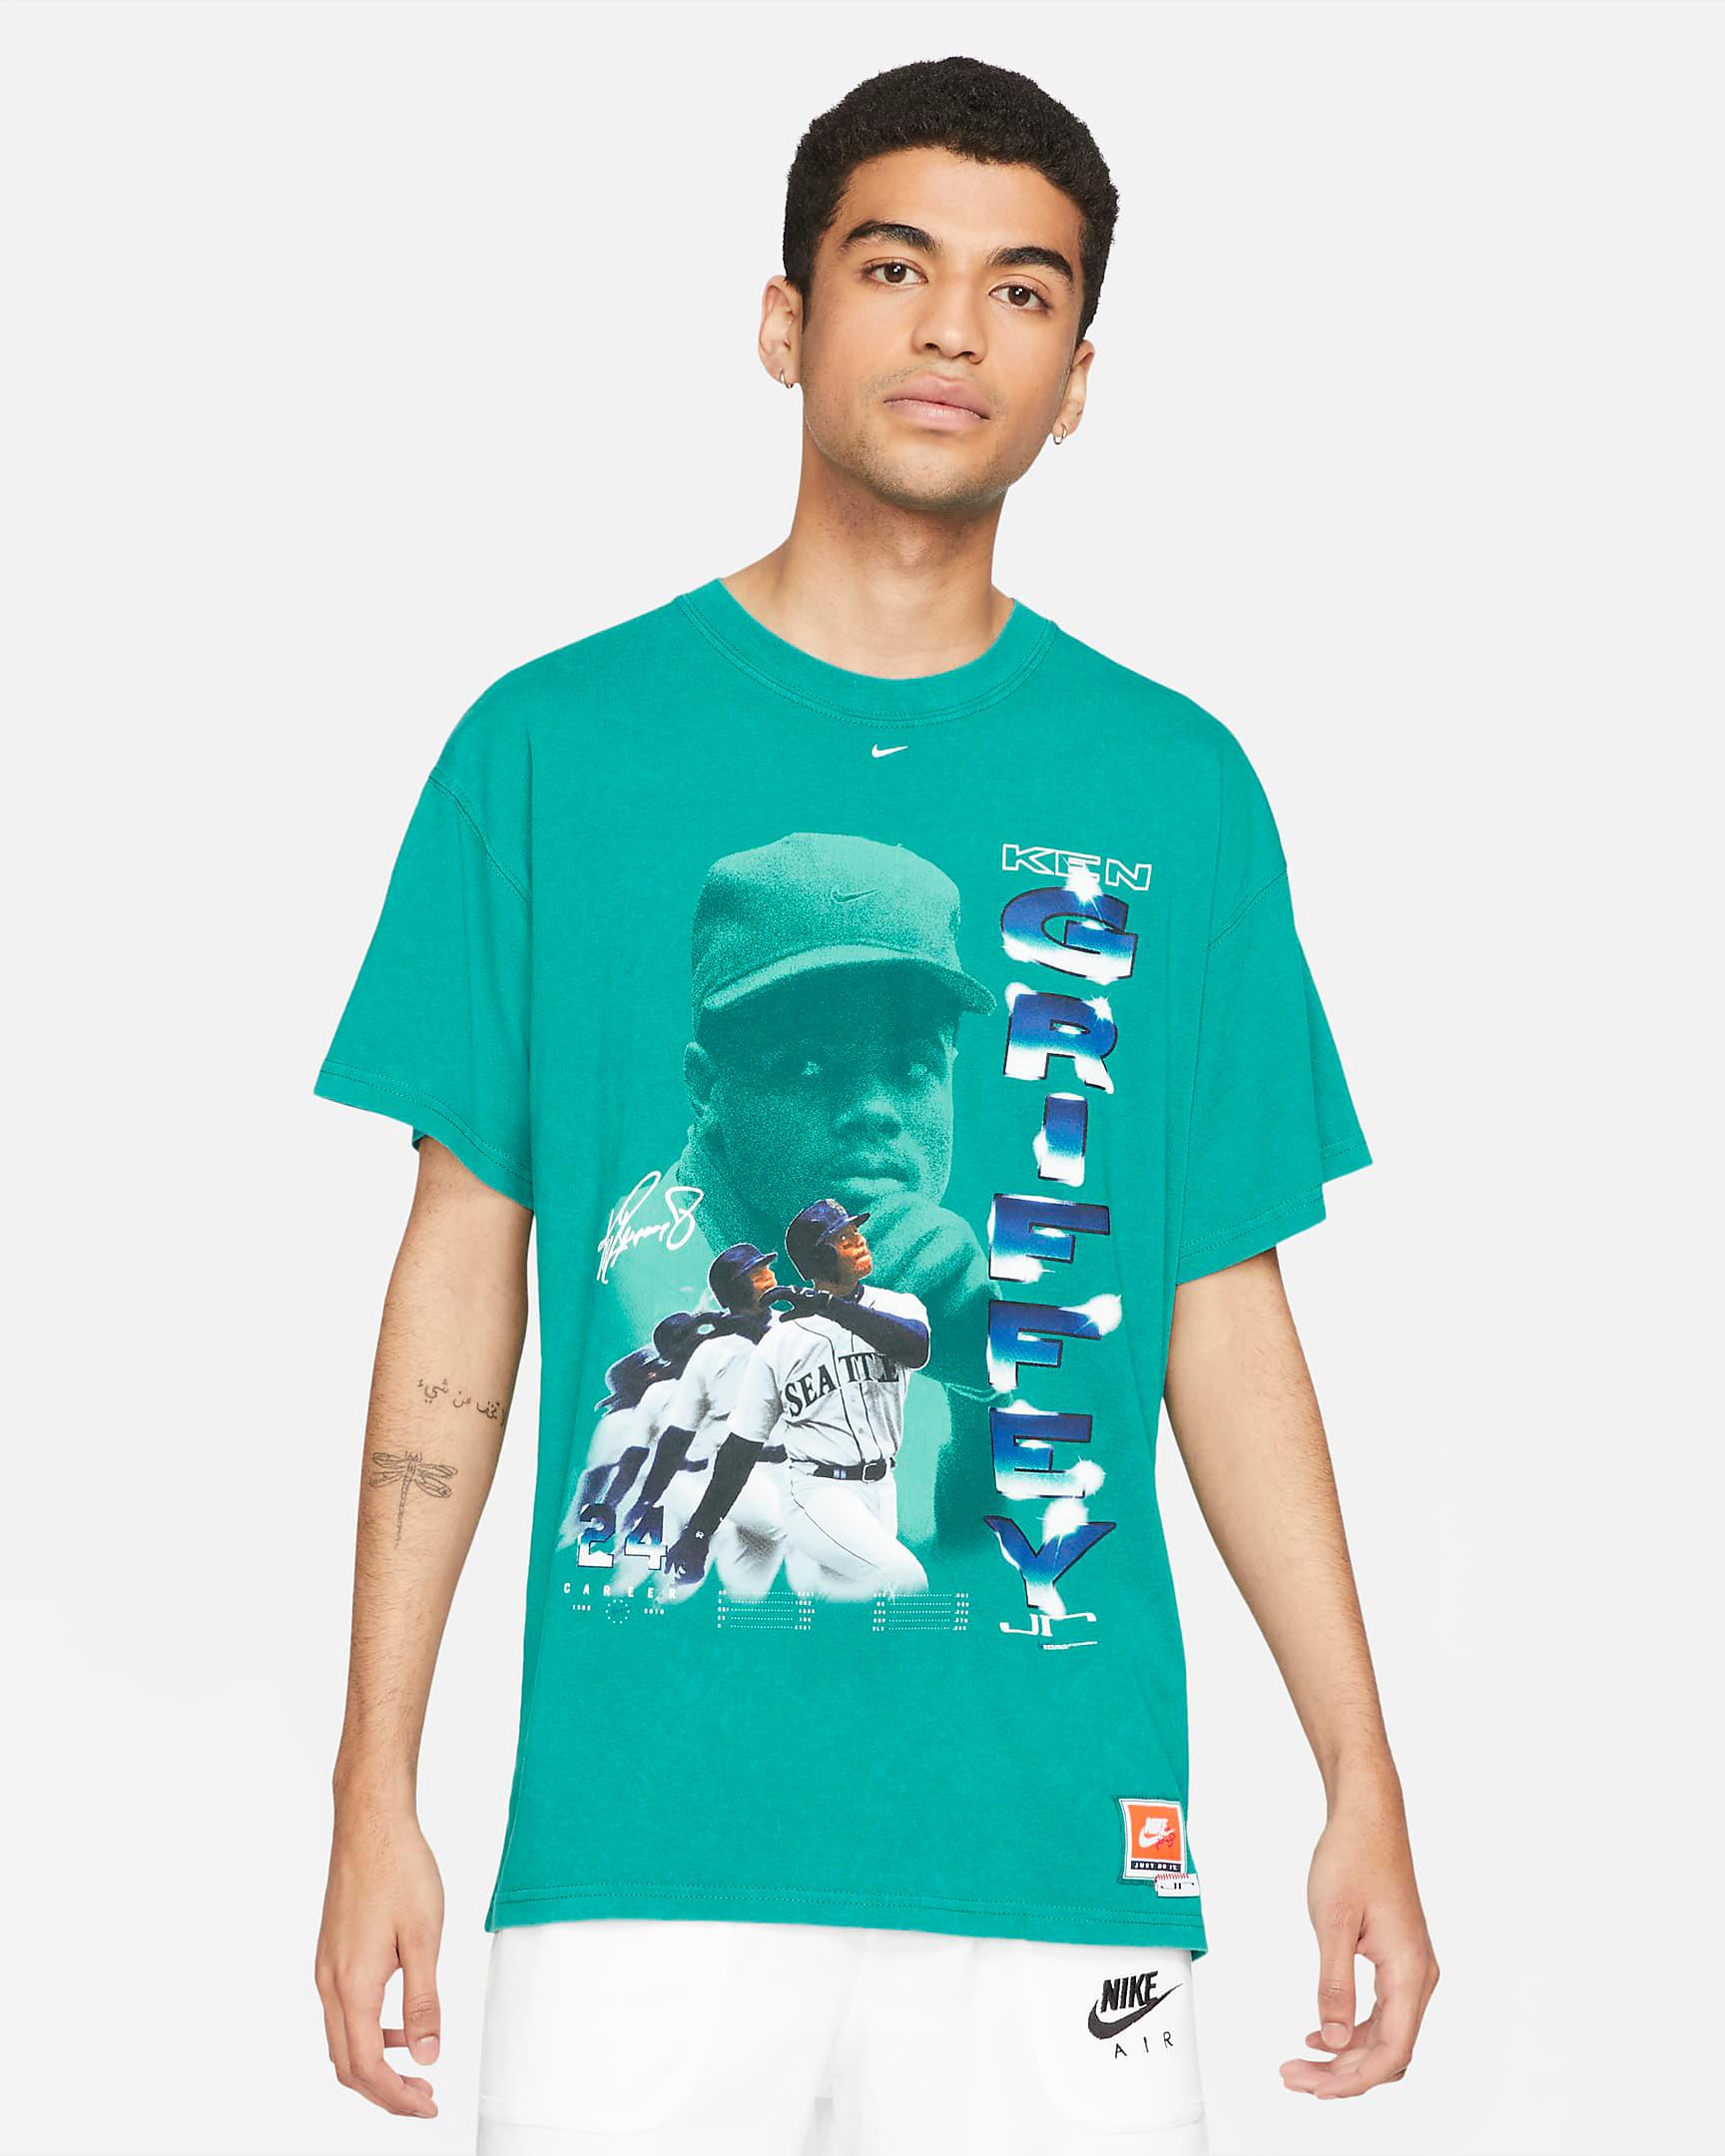 nike-ken-griffey-jr-swingman-shirt-fresh-water